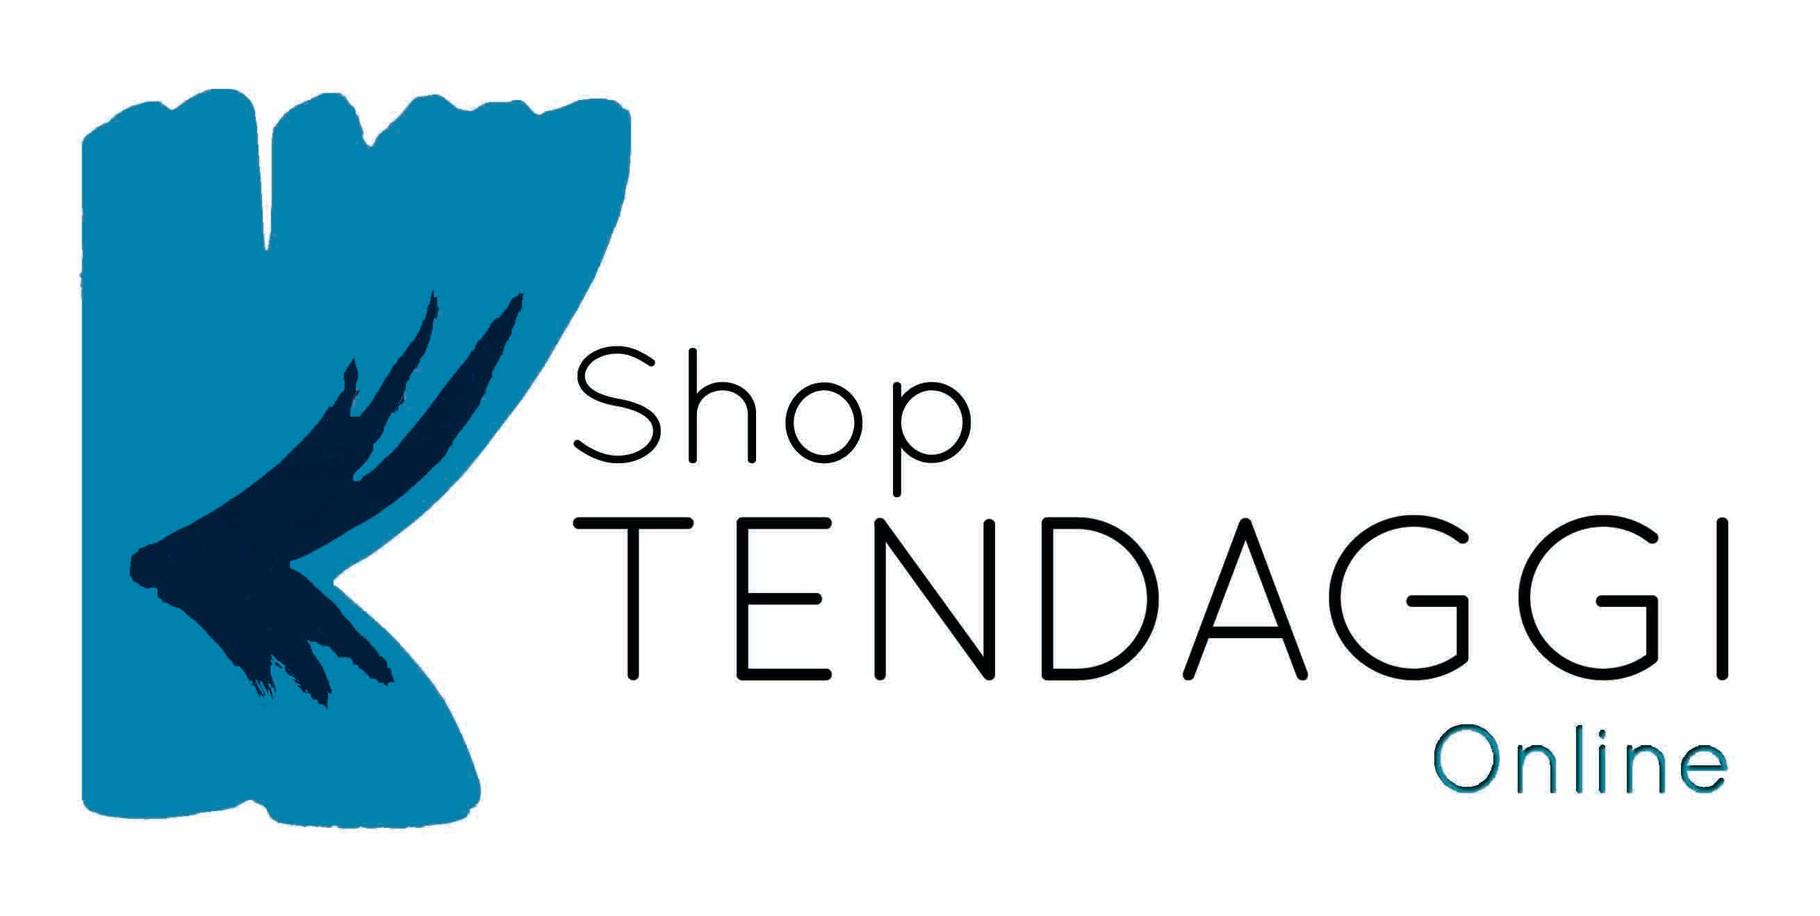 Vendita tende interni on line tende da interni moderne for Tendaggi online prezzi